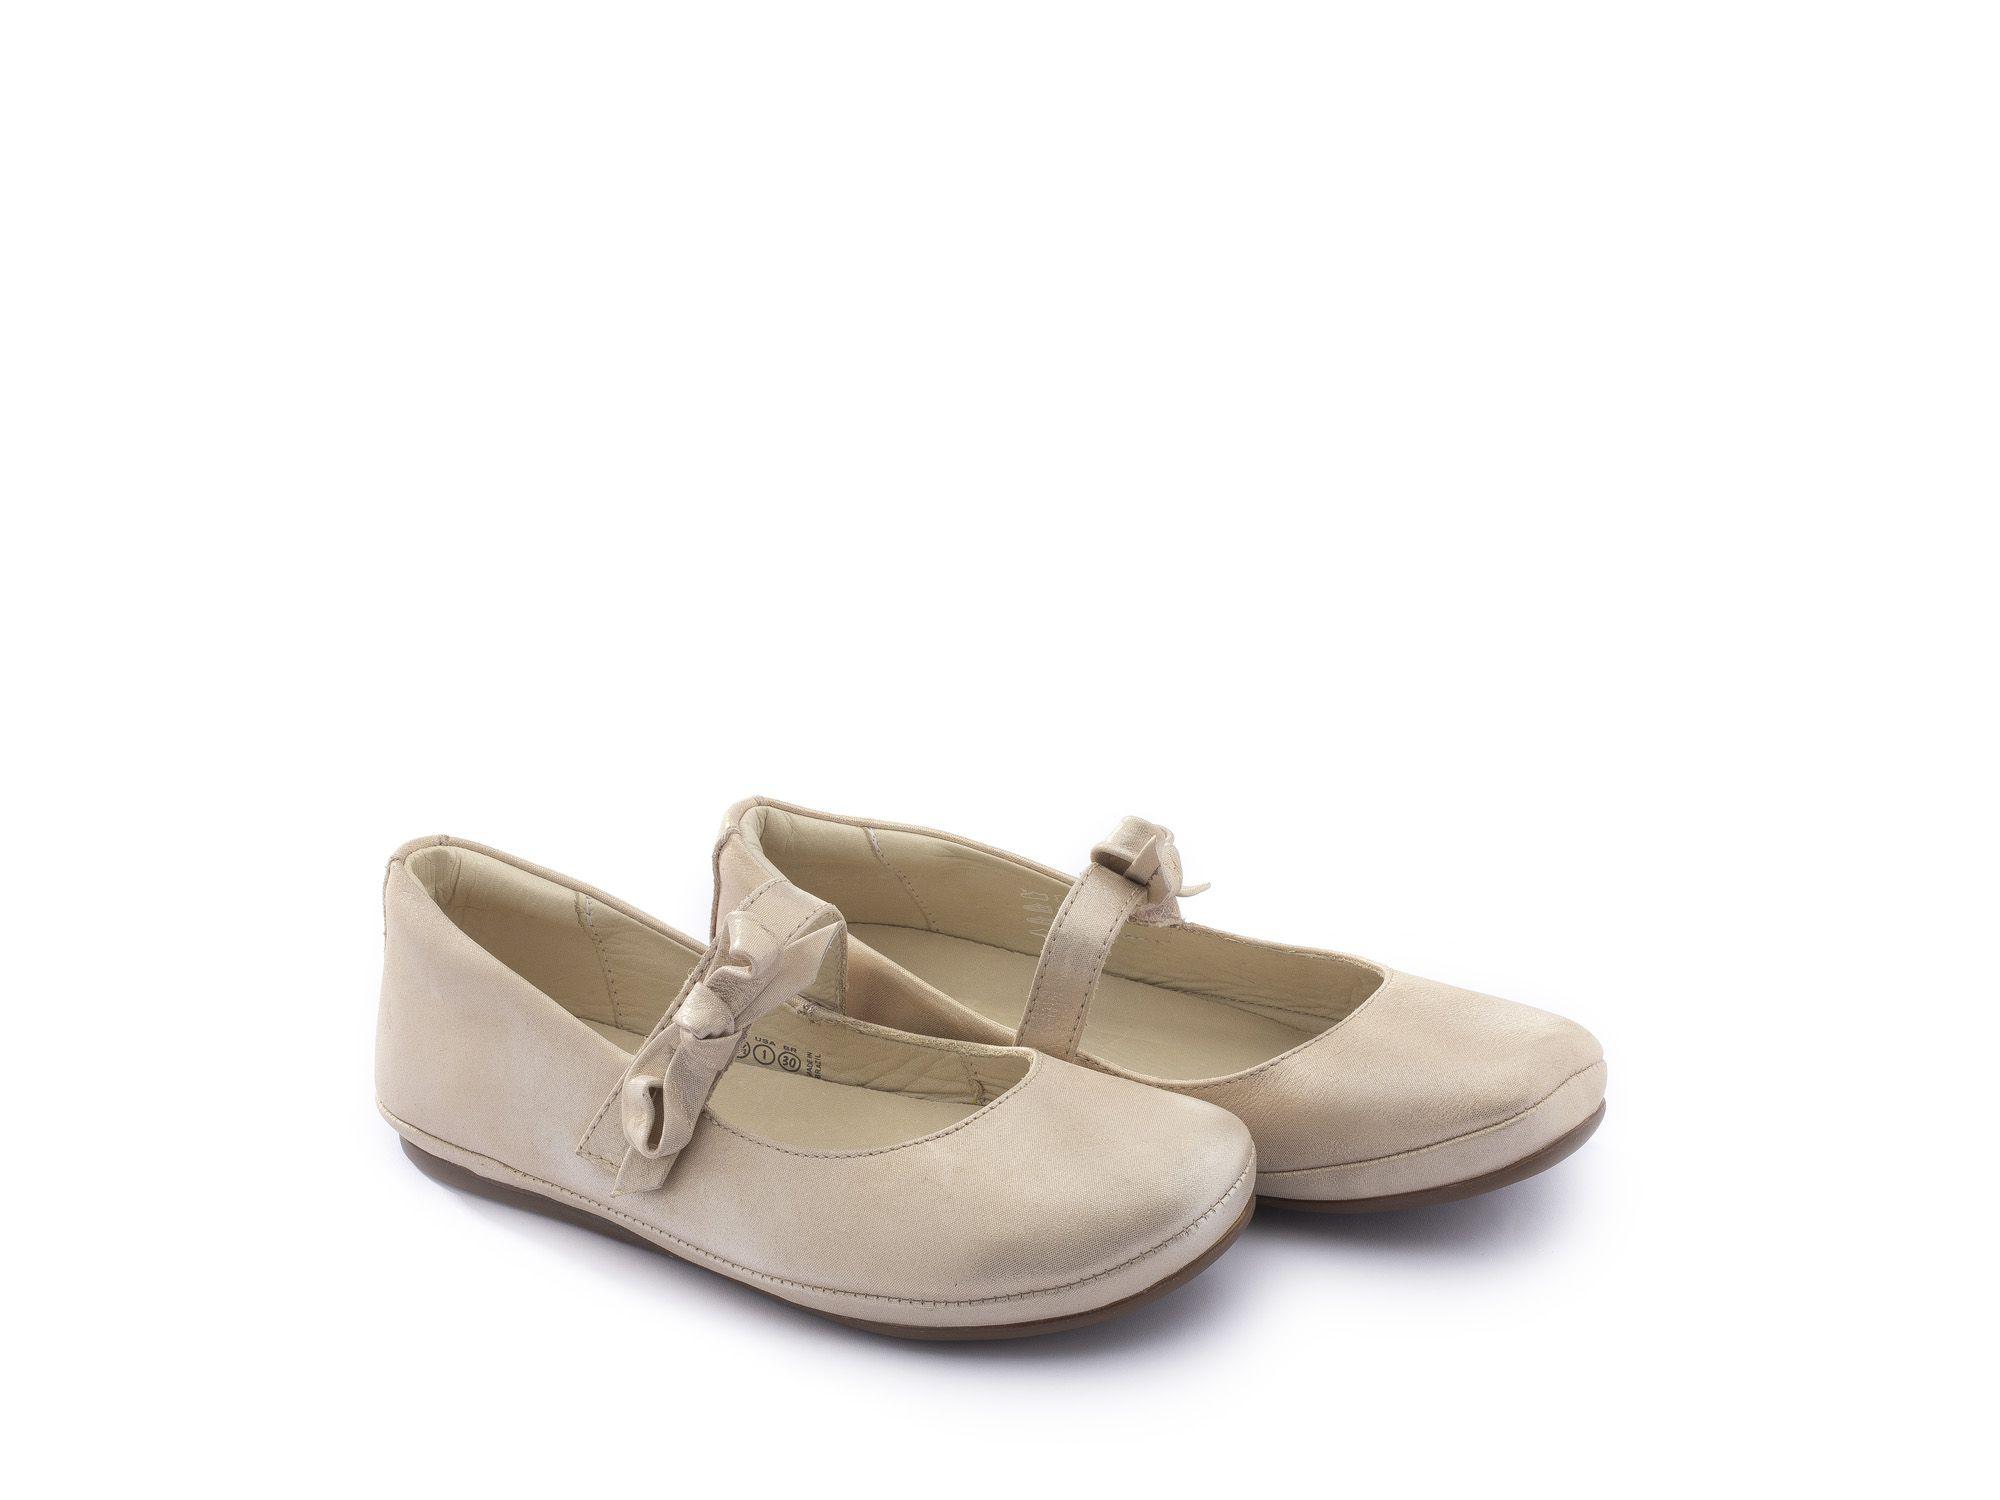 Sapato Couro Cotton Candy Laço Doroth Tip Toey Joey